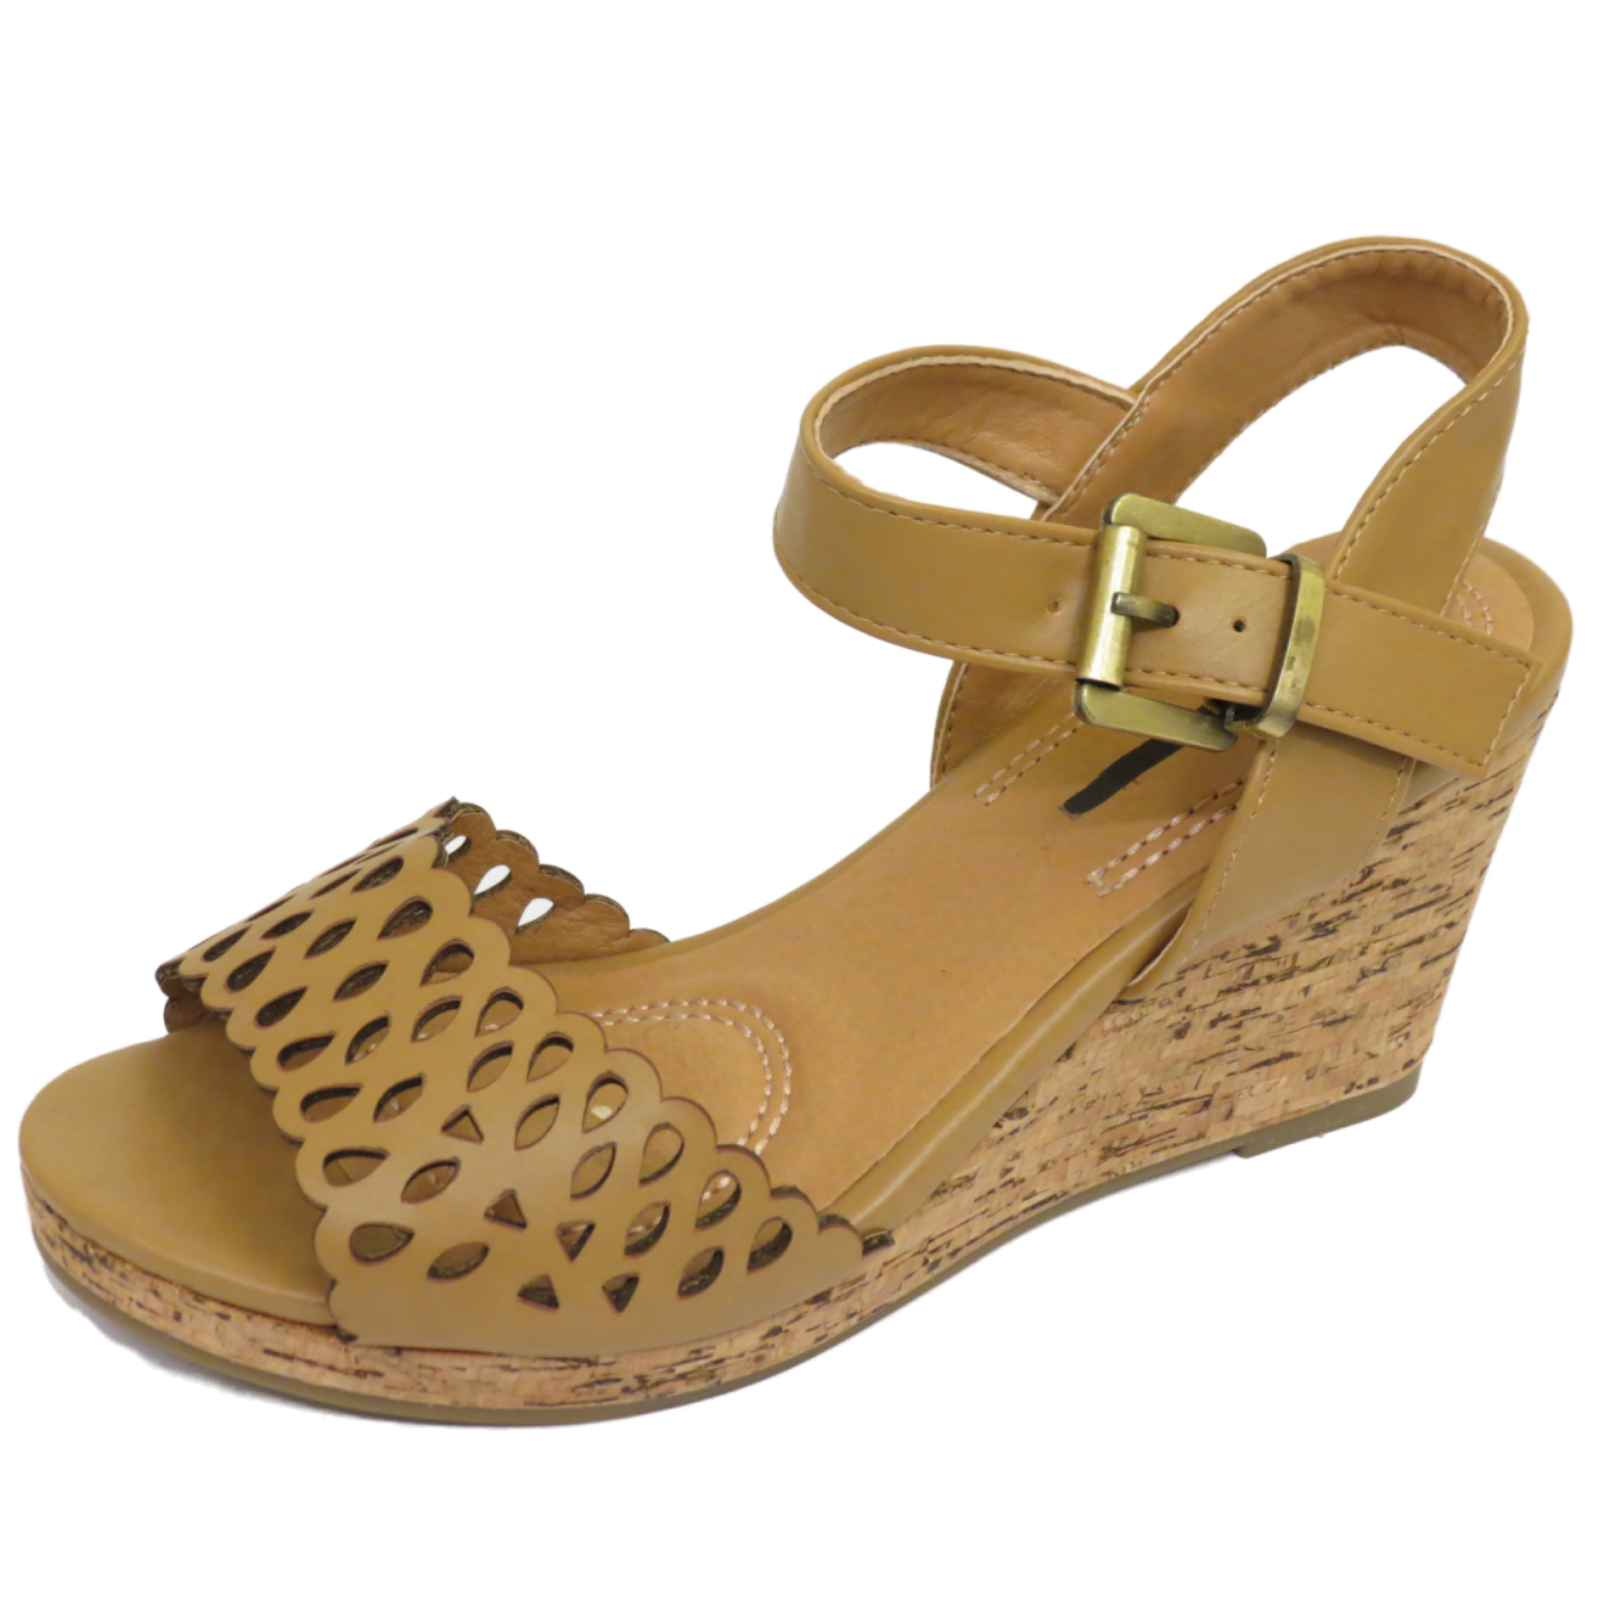 Mujer Tostado Plataforma Sandalias de verano Punta Abierta Tobillo Zapatos